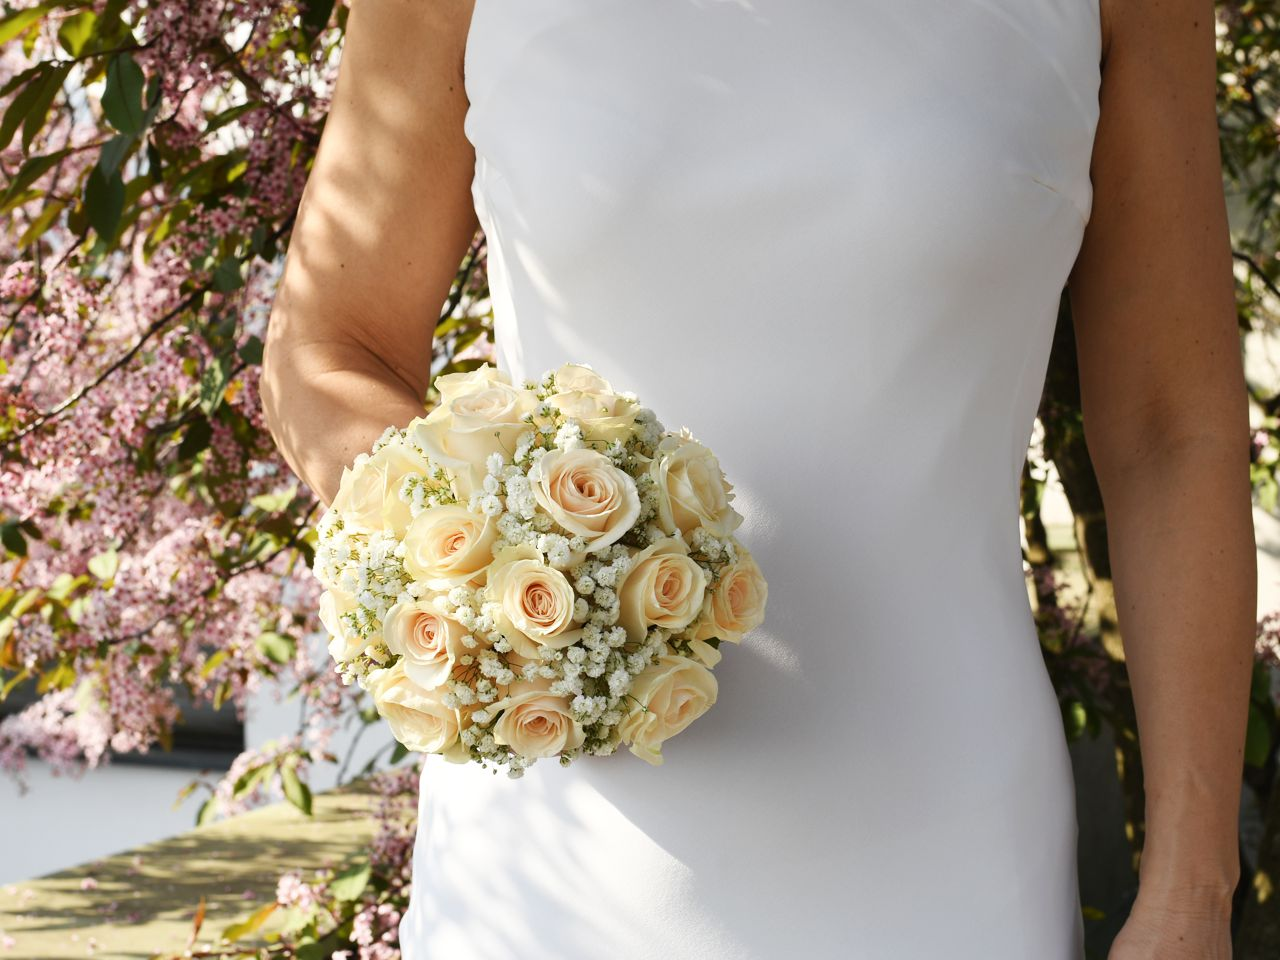 Hochzeitsfloristik Fotschl Blumen Wien Gartnerei Wien